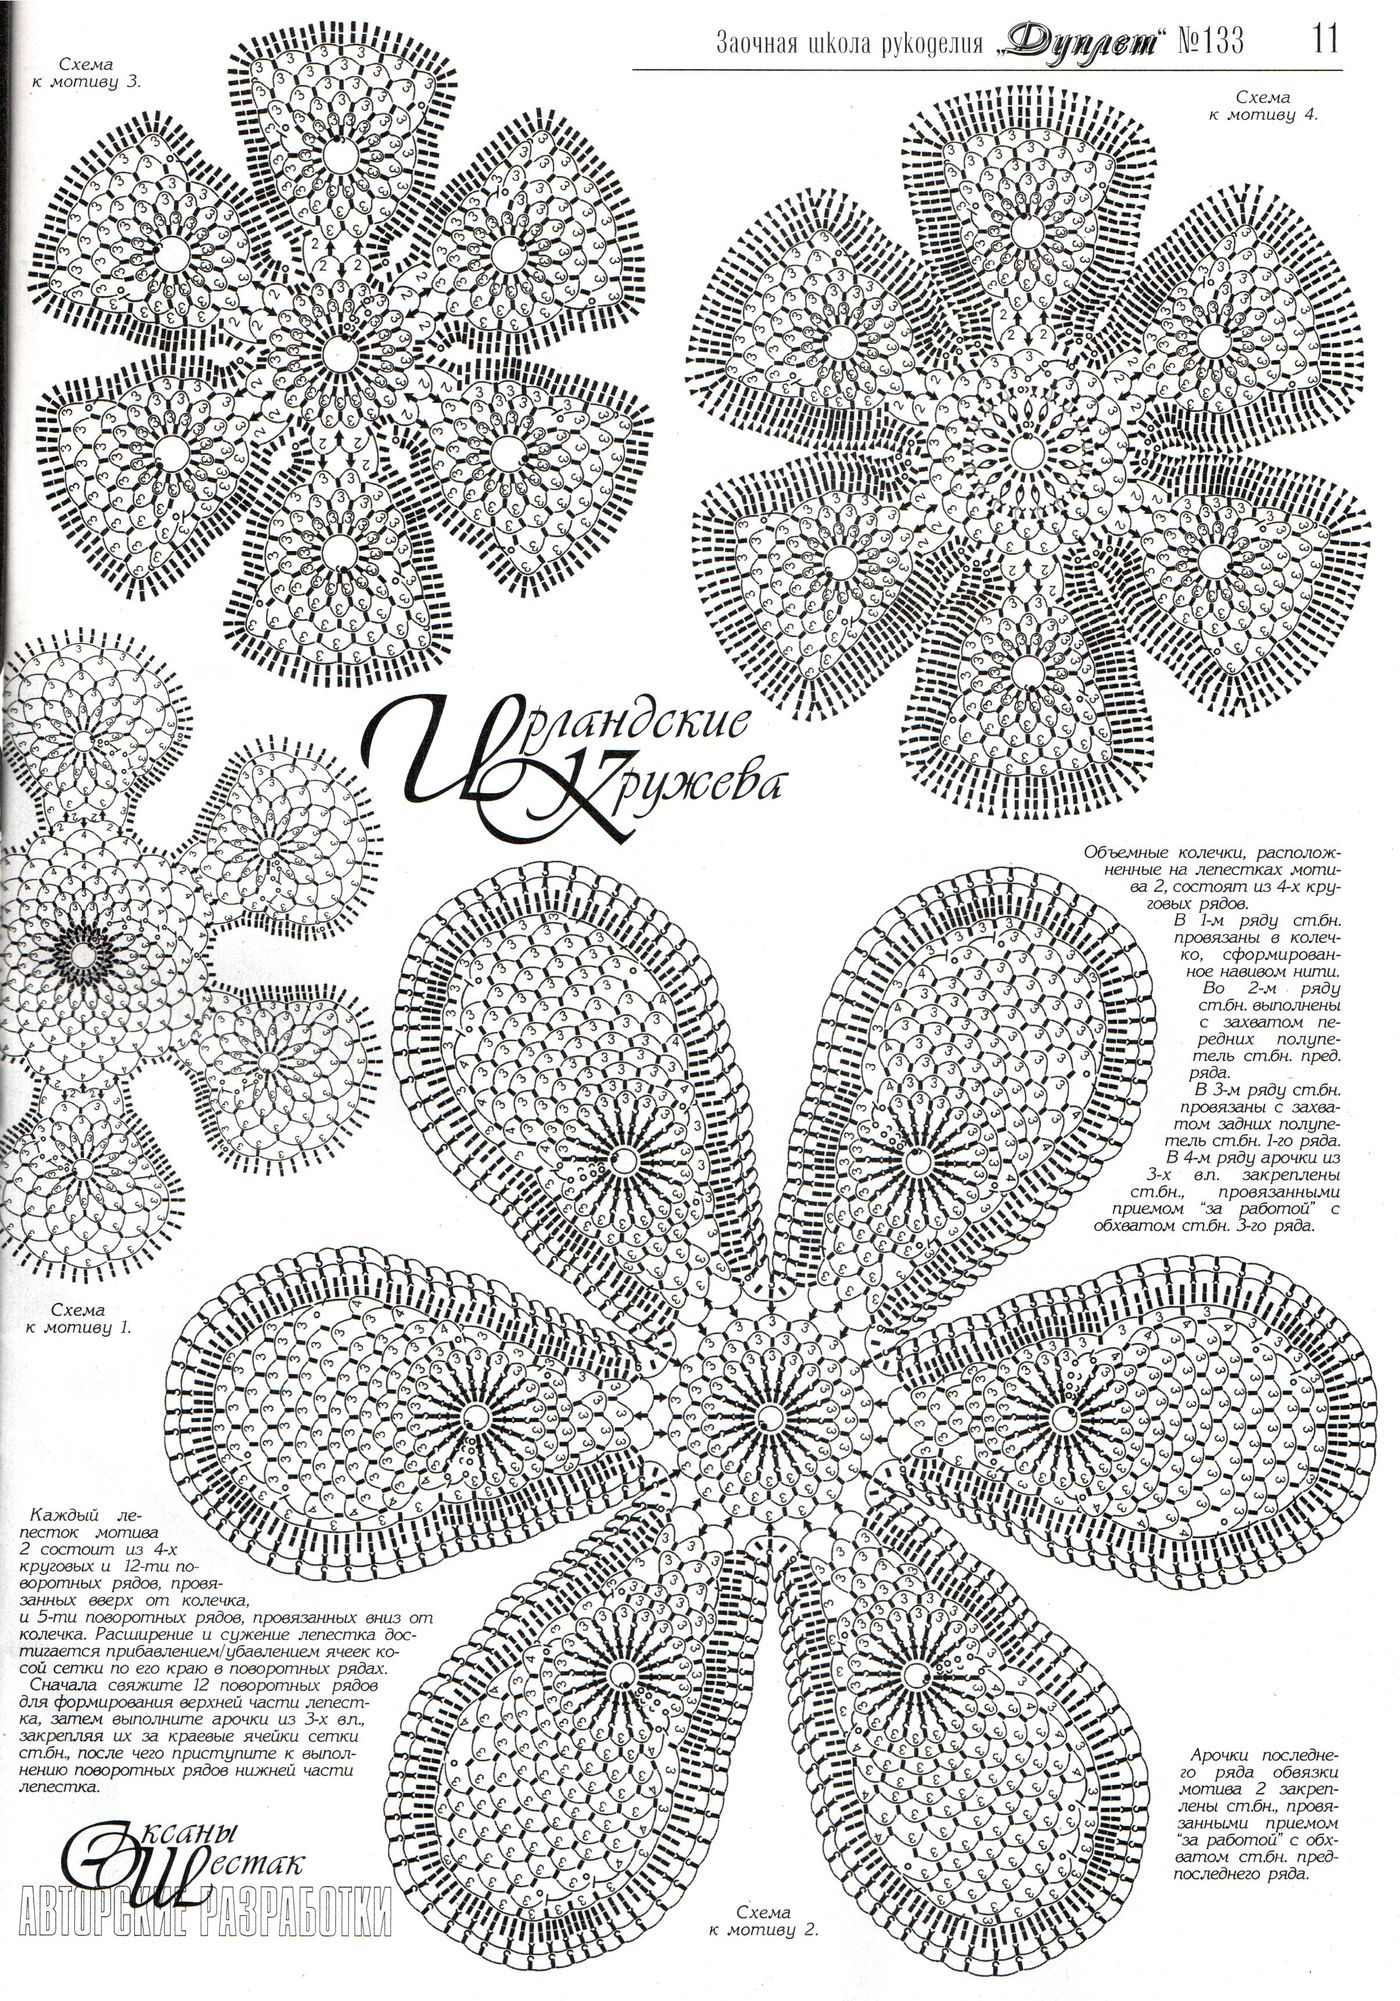 Pin de Claudia Lapa en Crochet Irlandes | Pinterest | Crochet ...